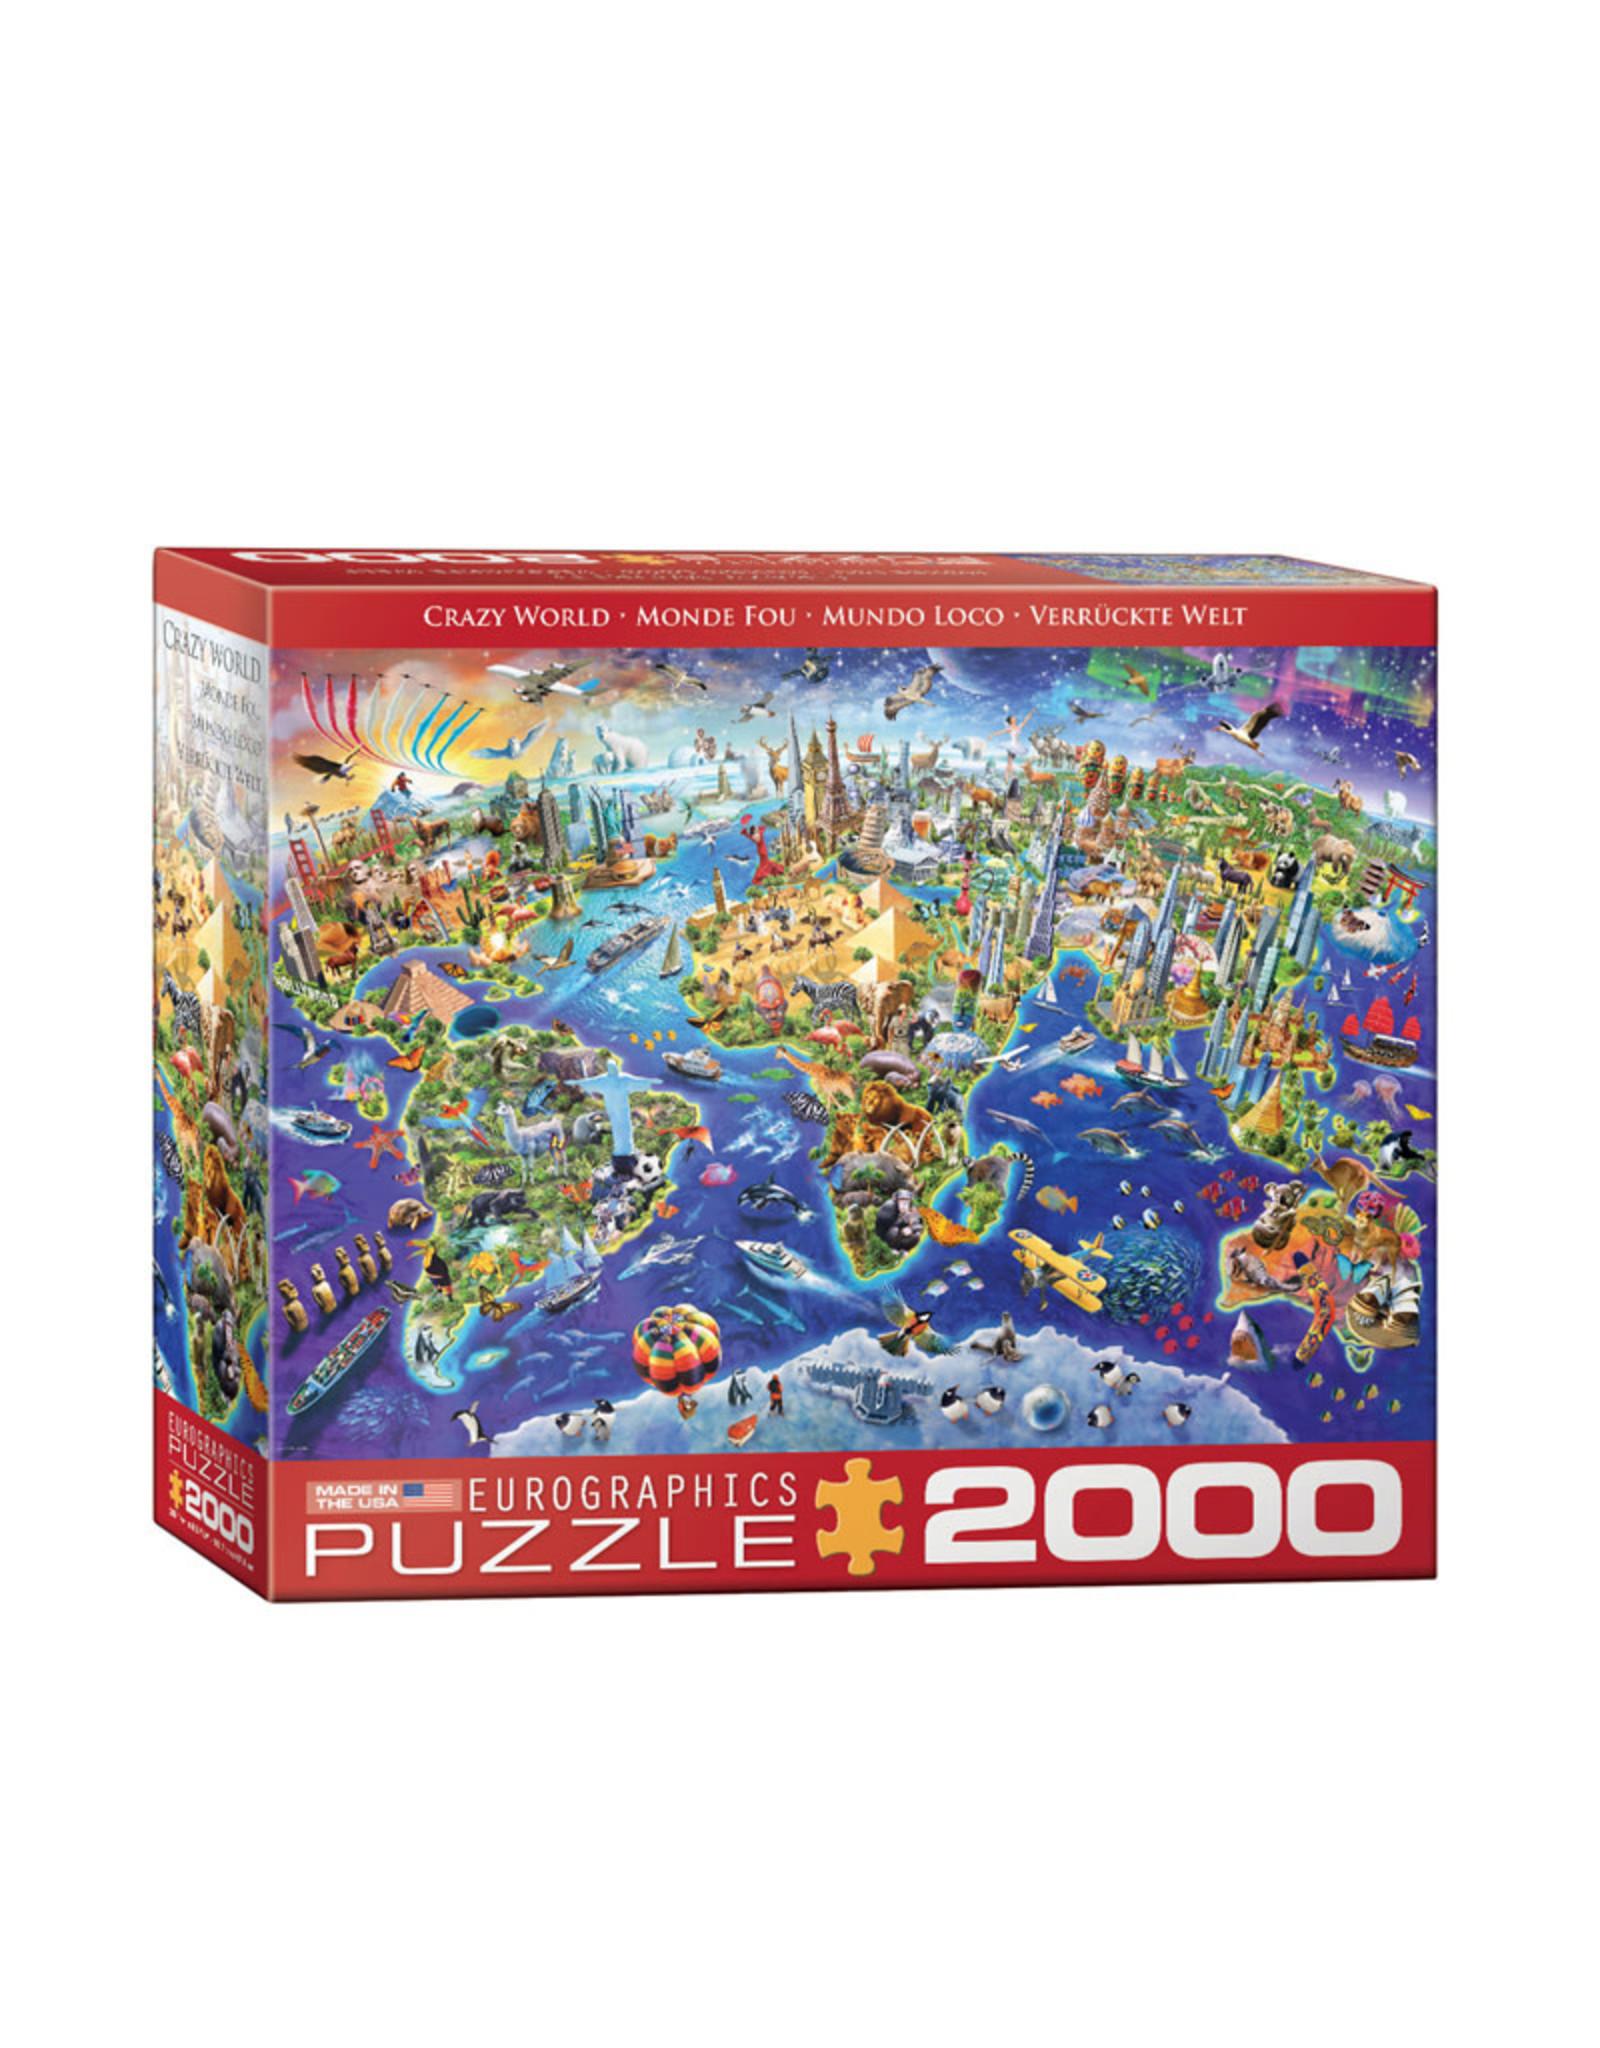 Eurographics Crazy World Puzzle 2000 PCS